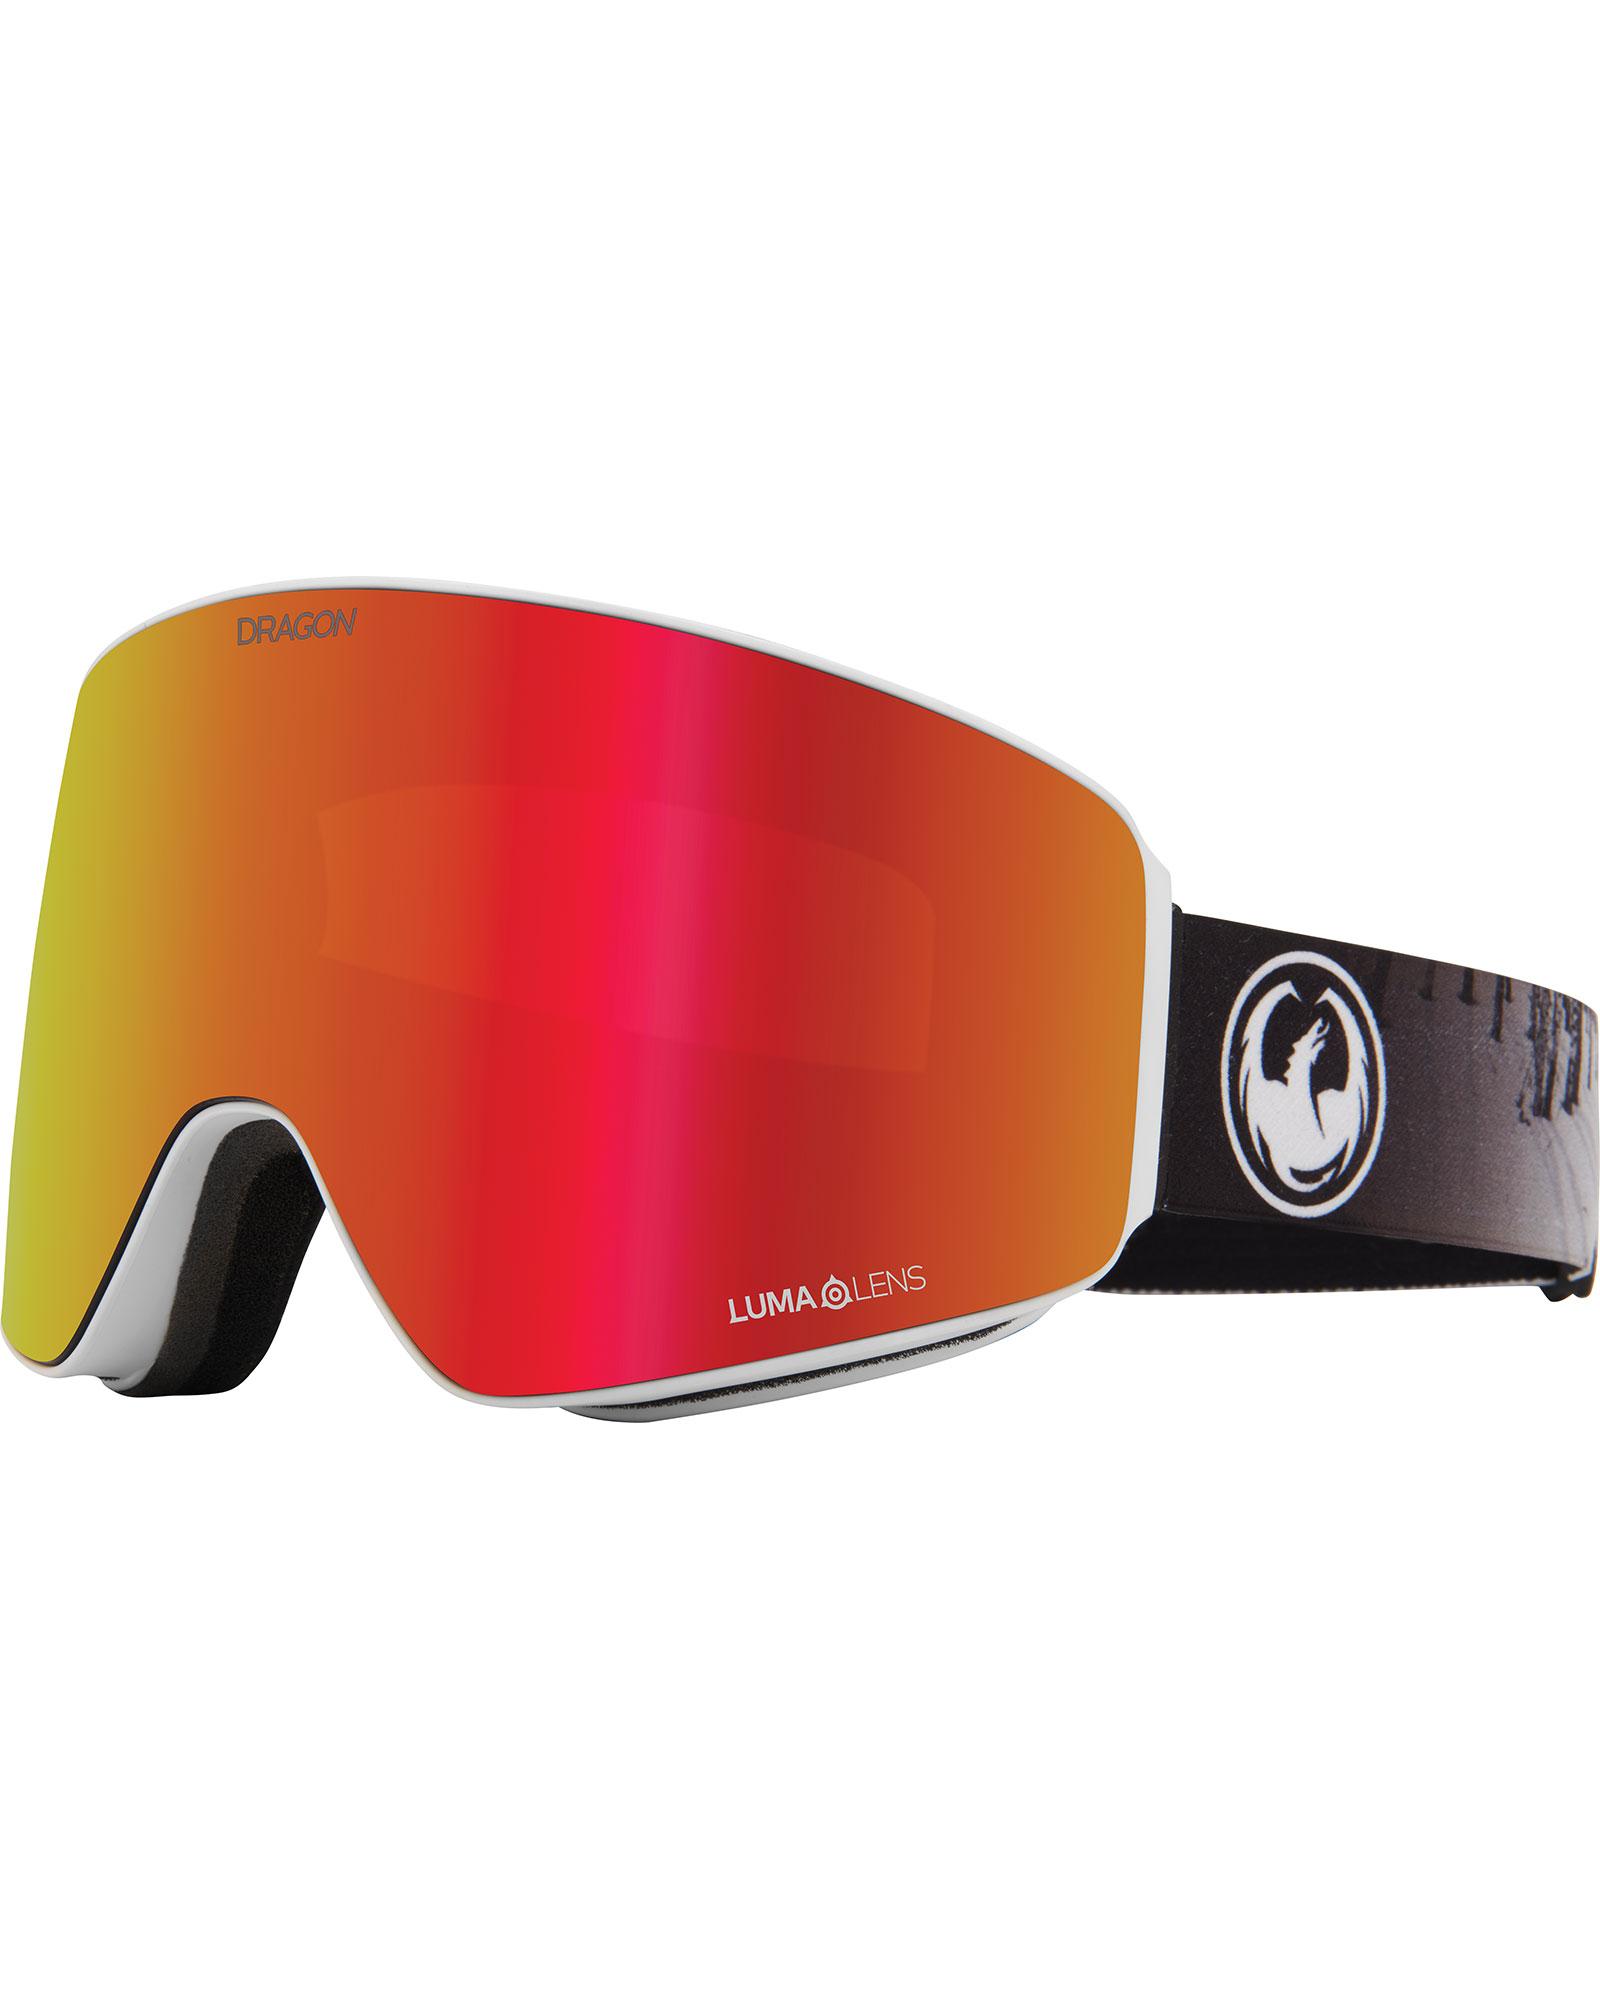 Dragon PXV The Calm / Lumalens Red Ionized + Lumalens Rose Goggles 2020 / 2021 0